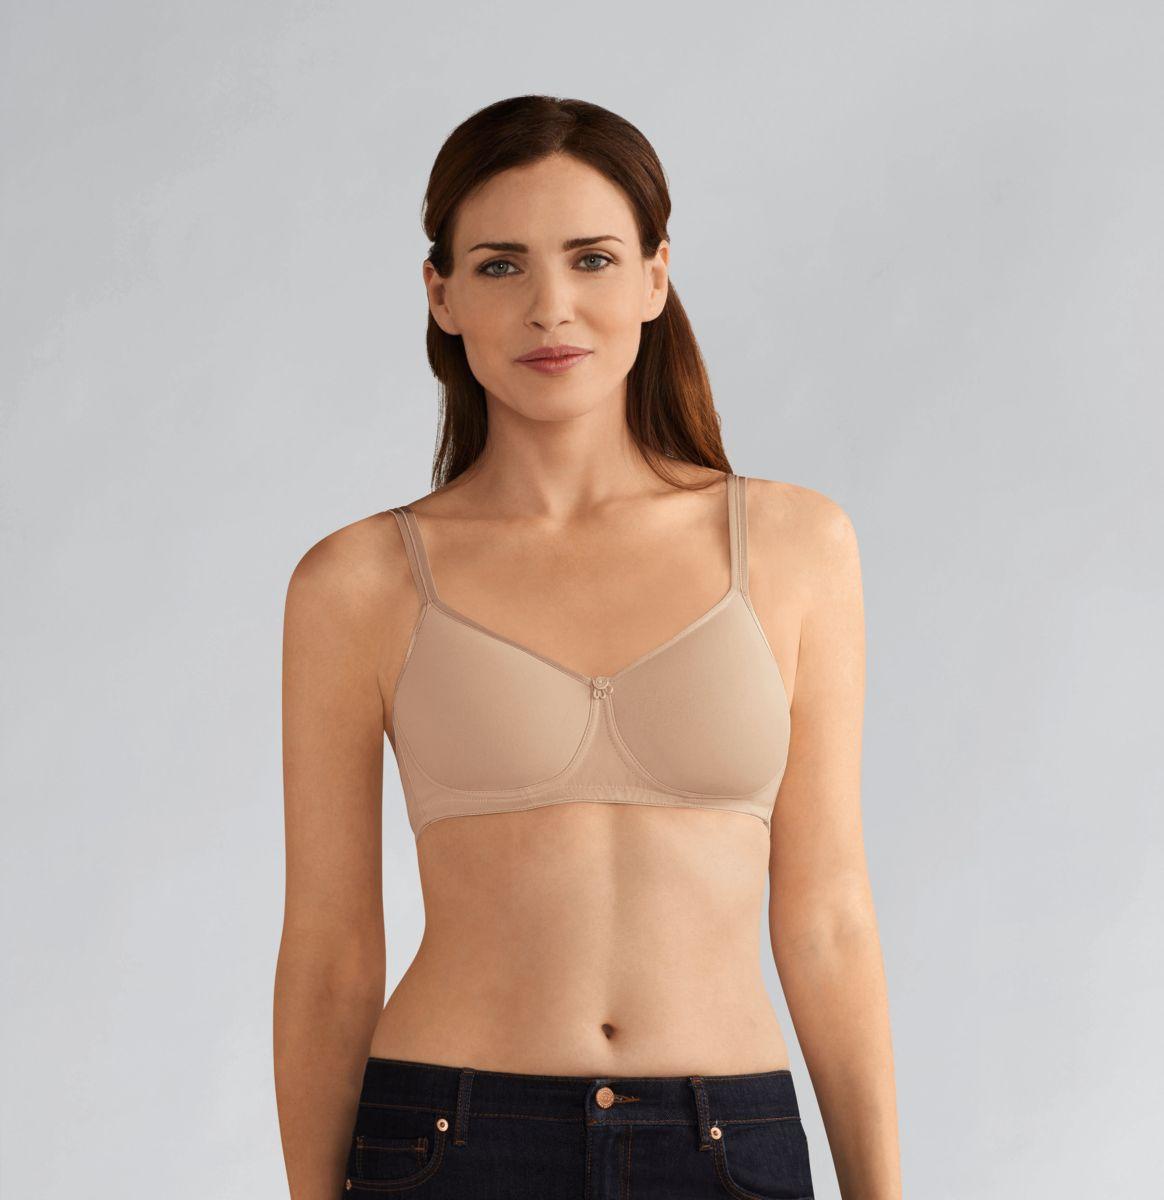 566fa7a0a7ba0 Mara Padded Post-Mastectomy Bra - Bravelle